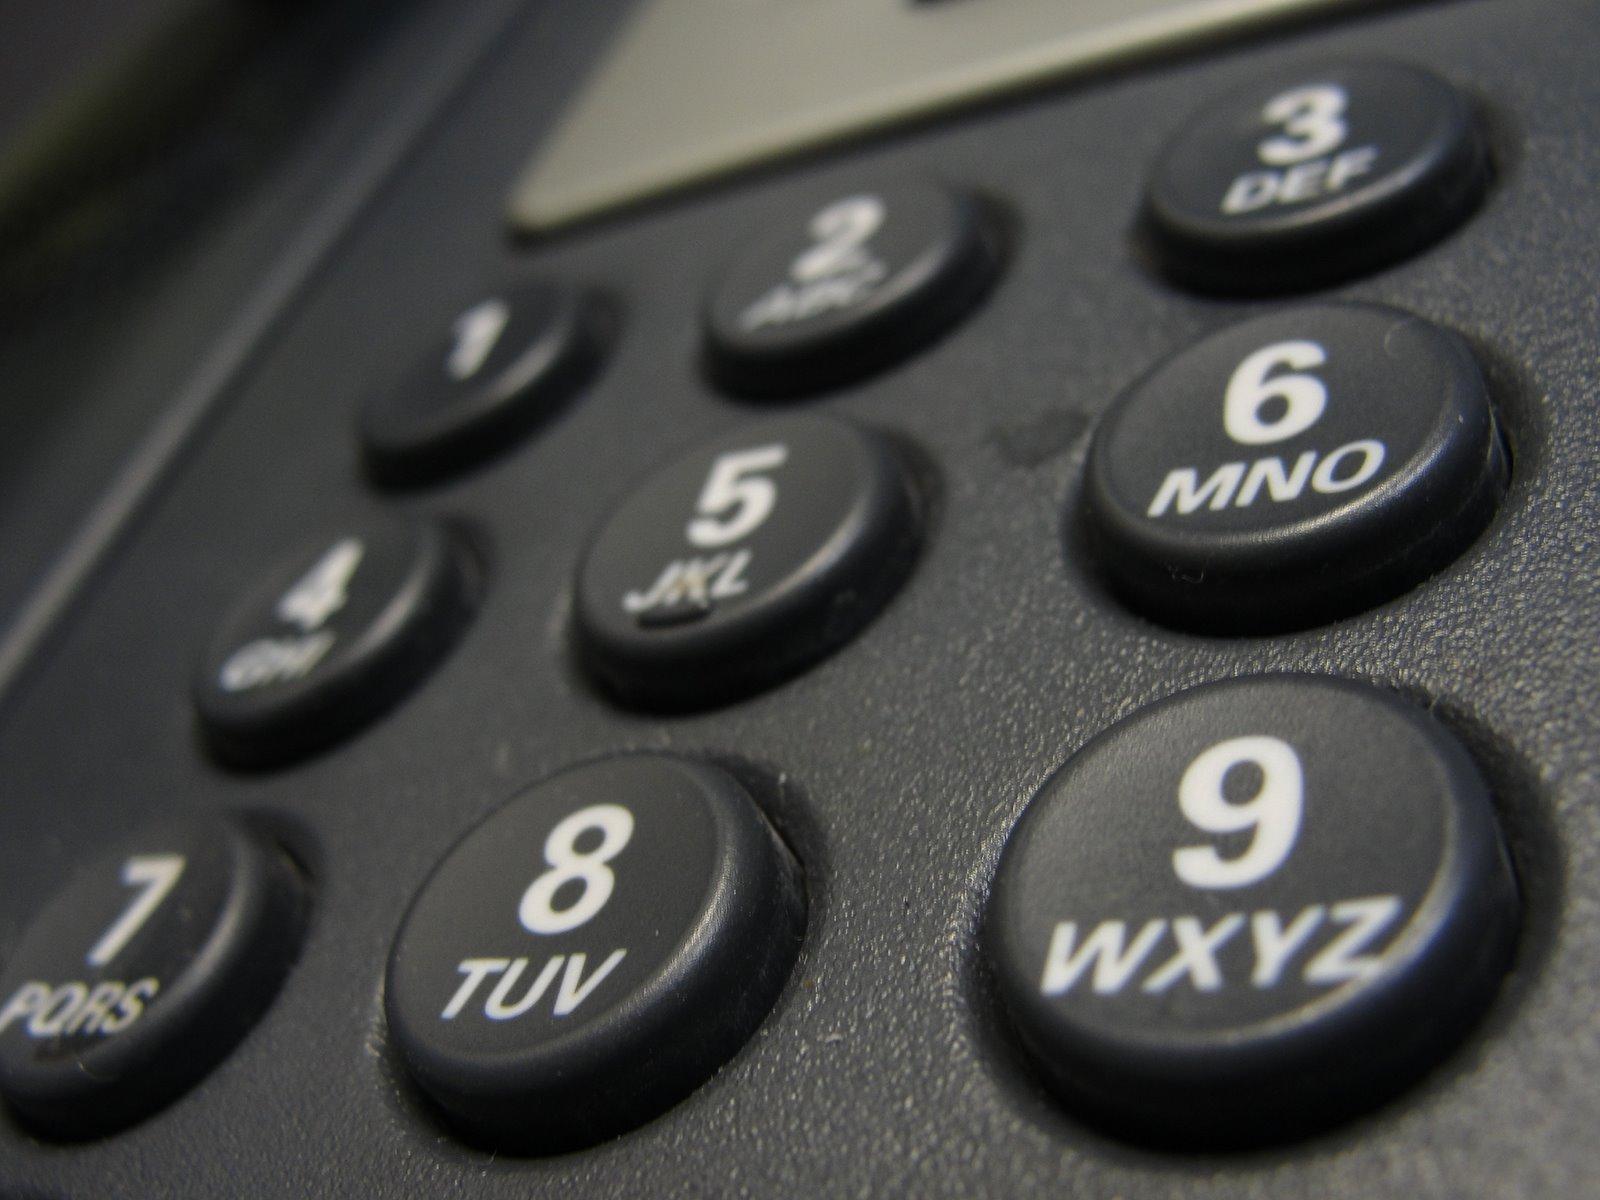 Chillicothe phone scam